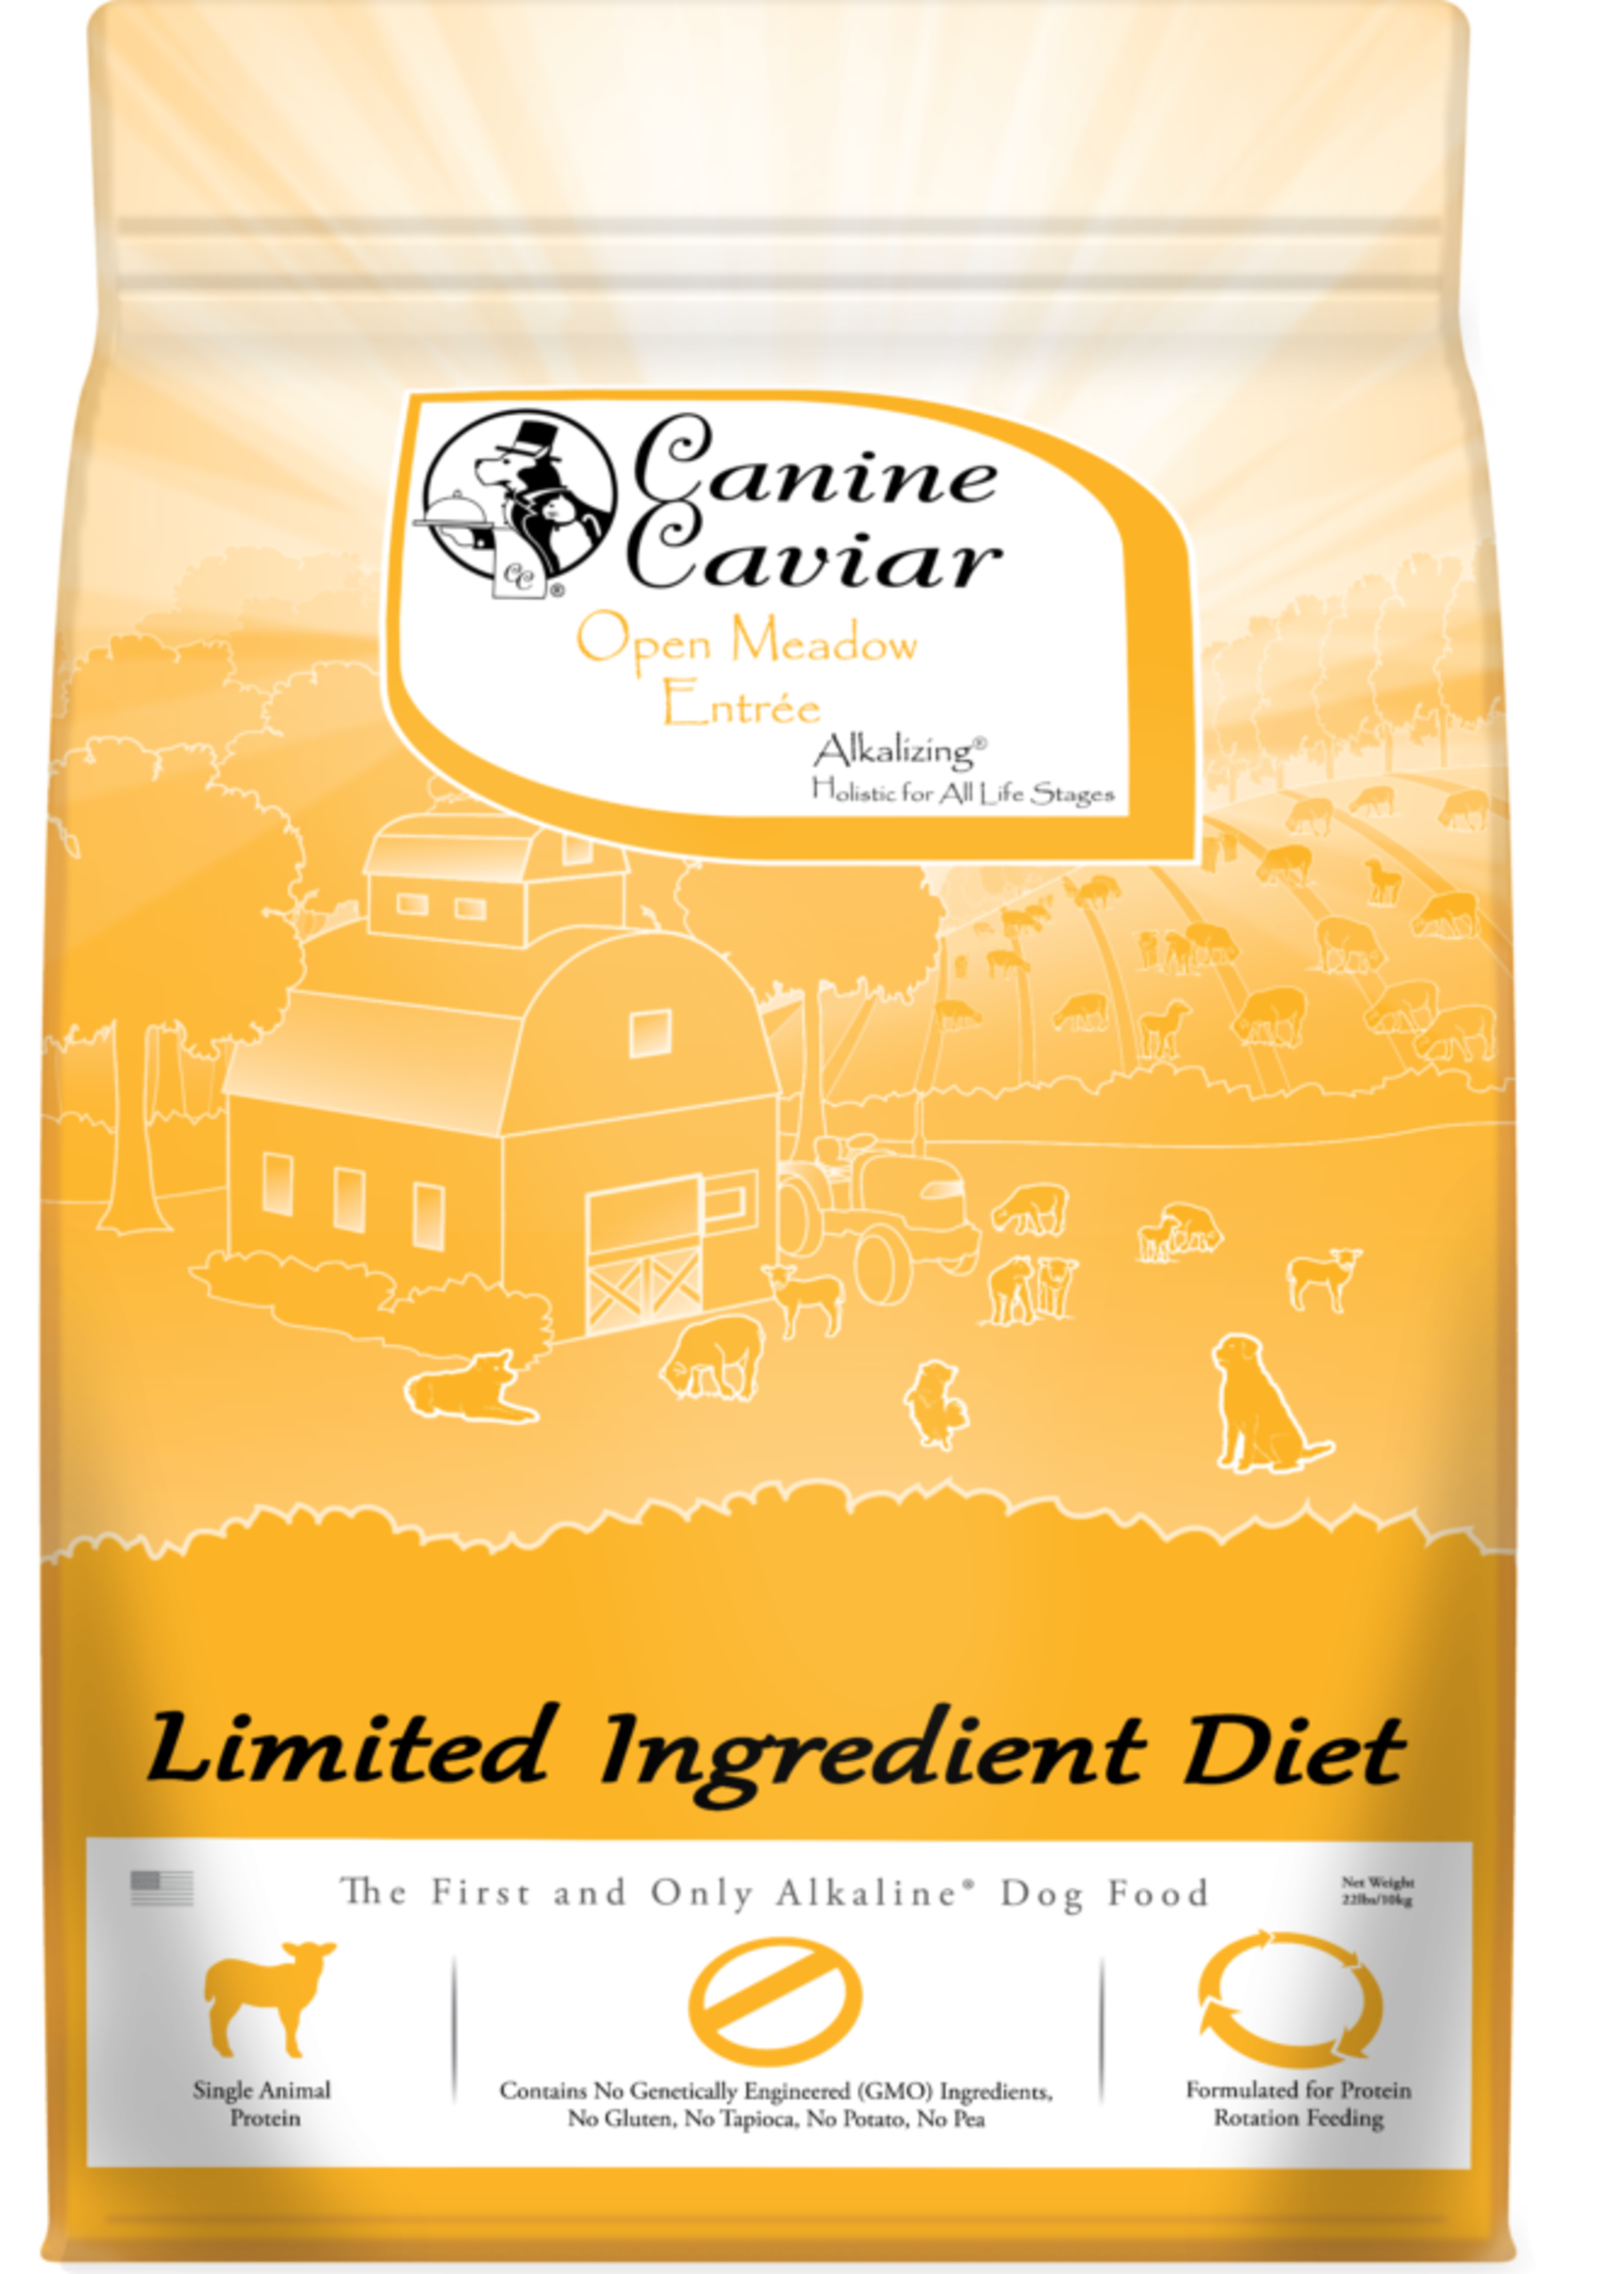 Canine Caviar Canine Caviar Open Meadow L.I.D. Alkaline Holistic Entree 11lbs